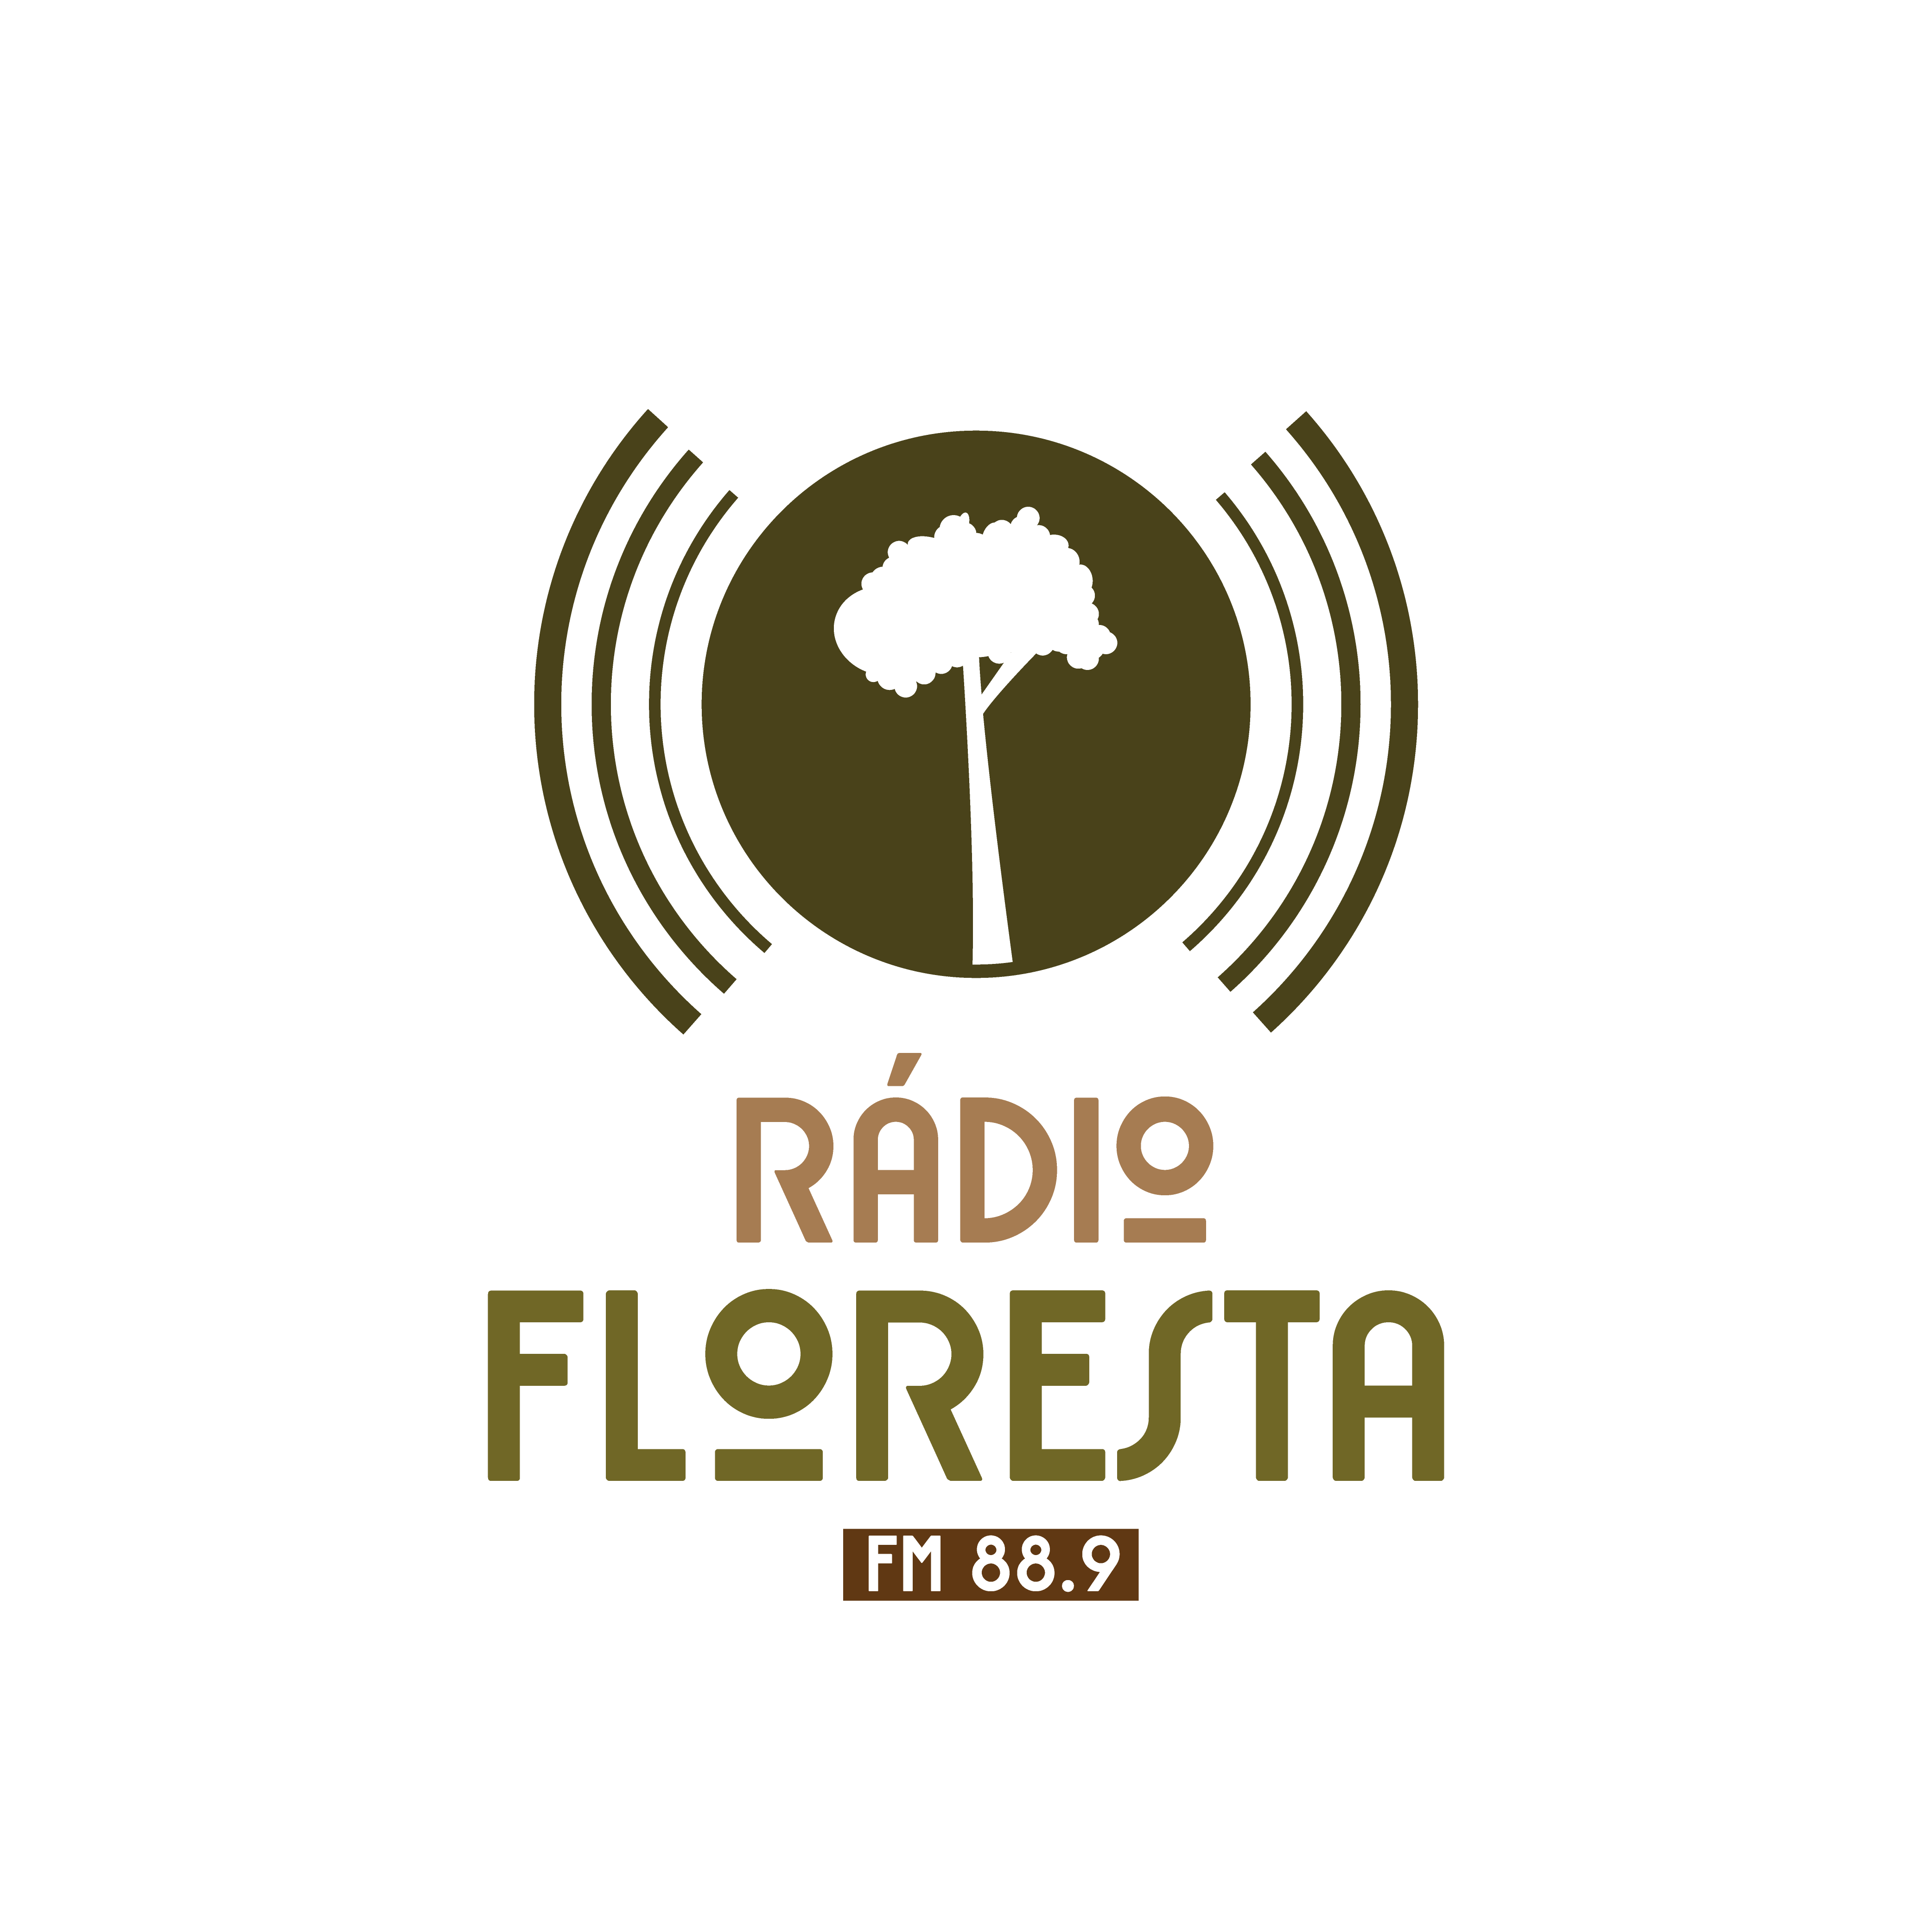 RÁDIO FLORESTA logo